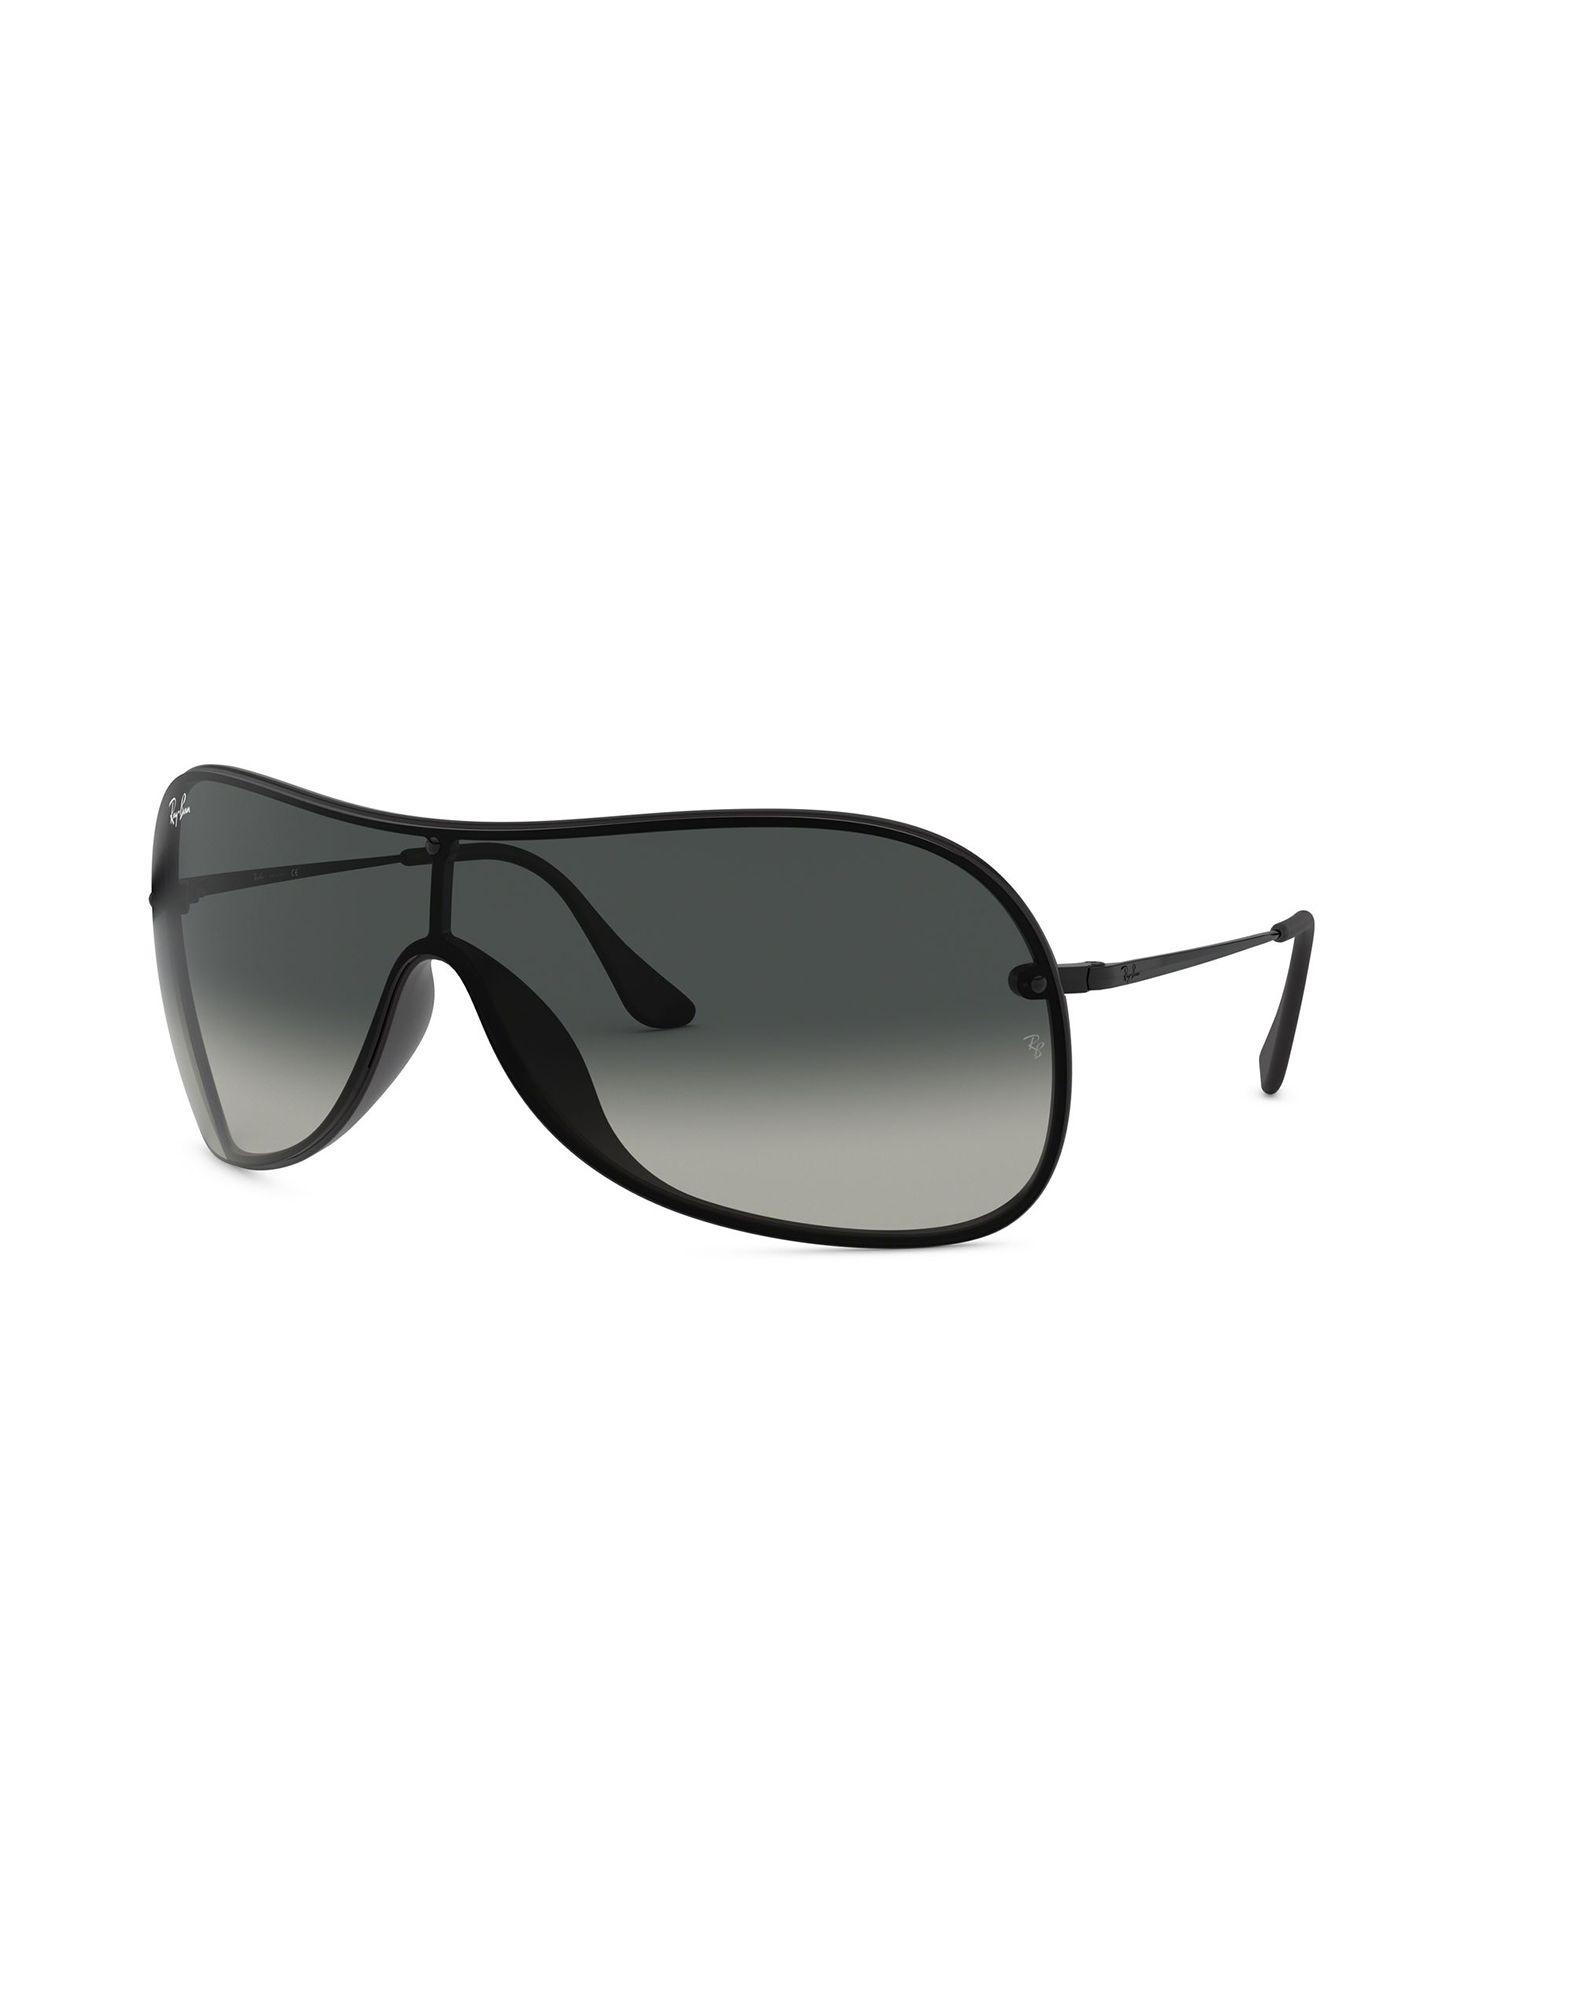 ray ban aviator sunglasses plastic frame